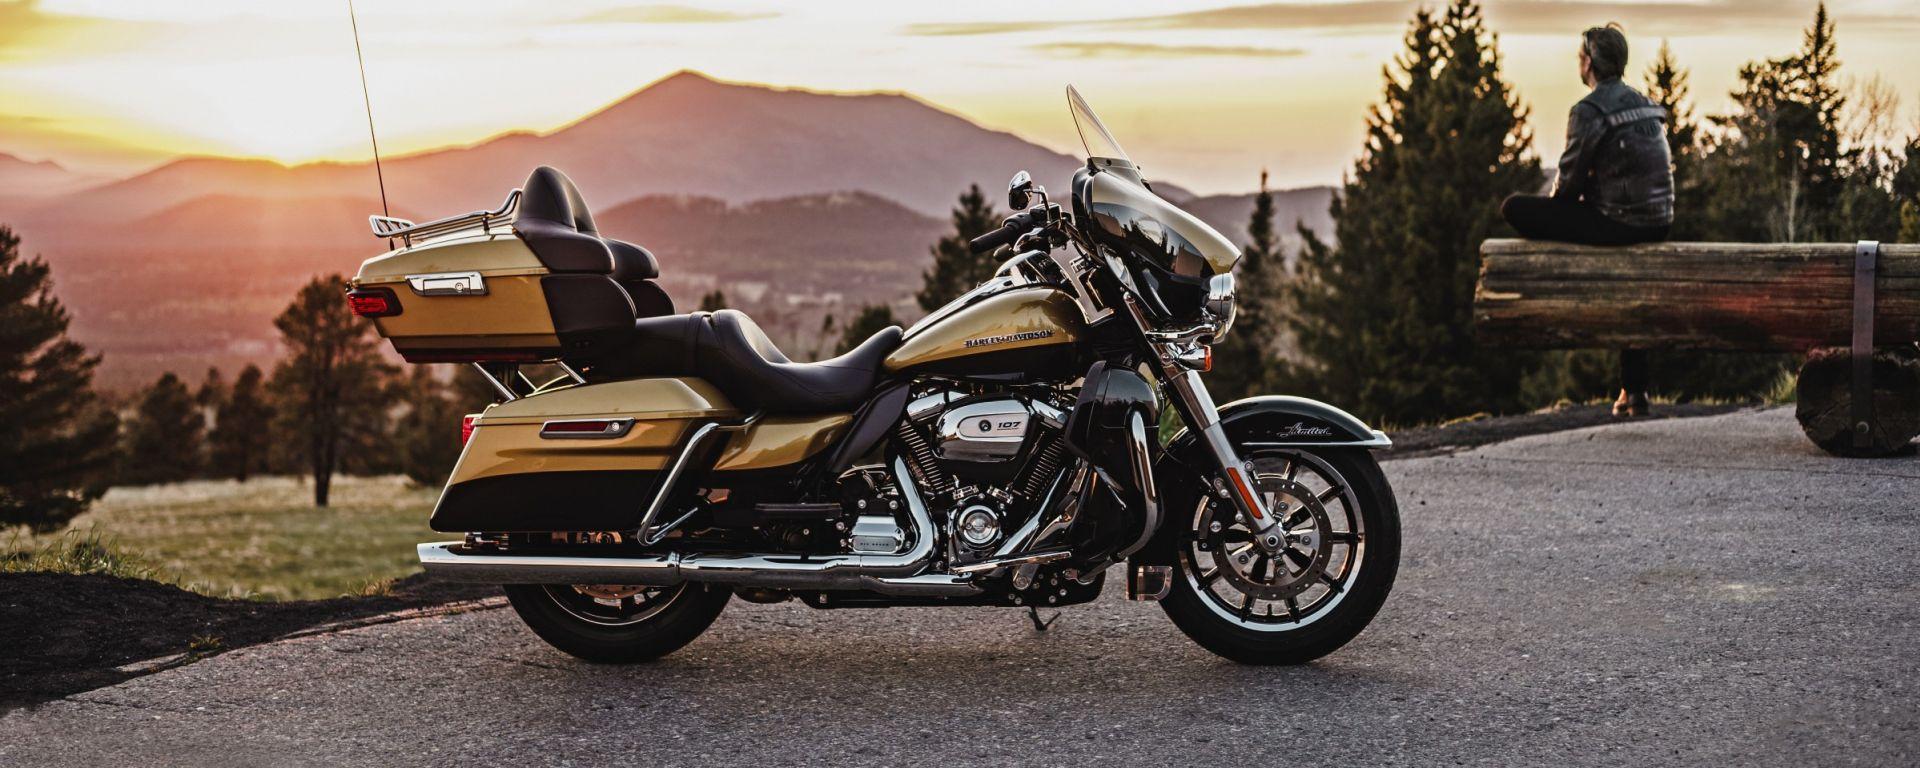 Harley-Davidson nuovo motore Milwaukee Eight